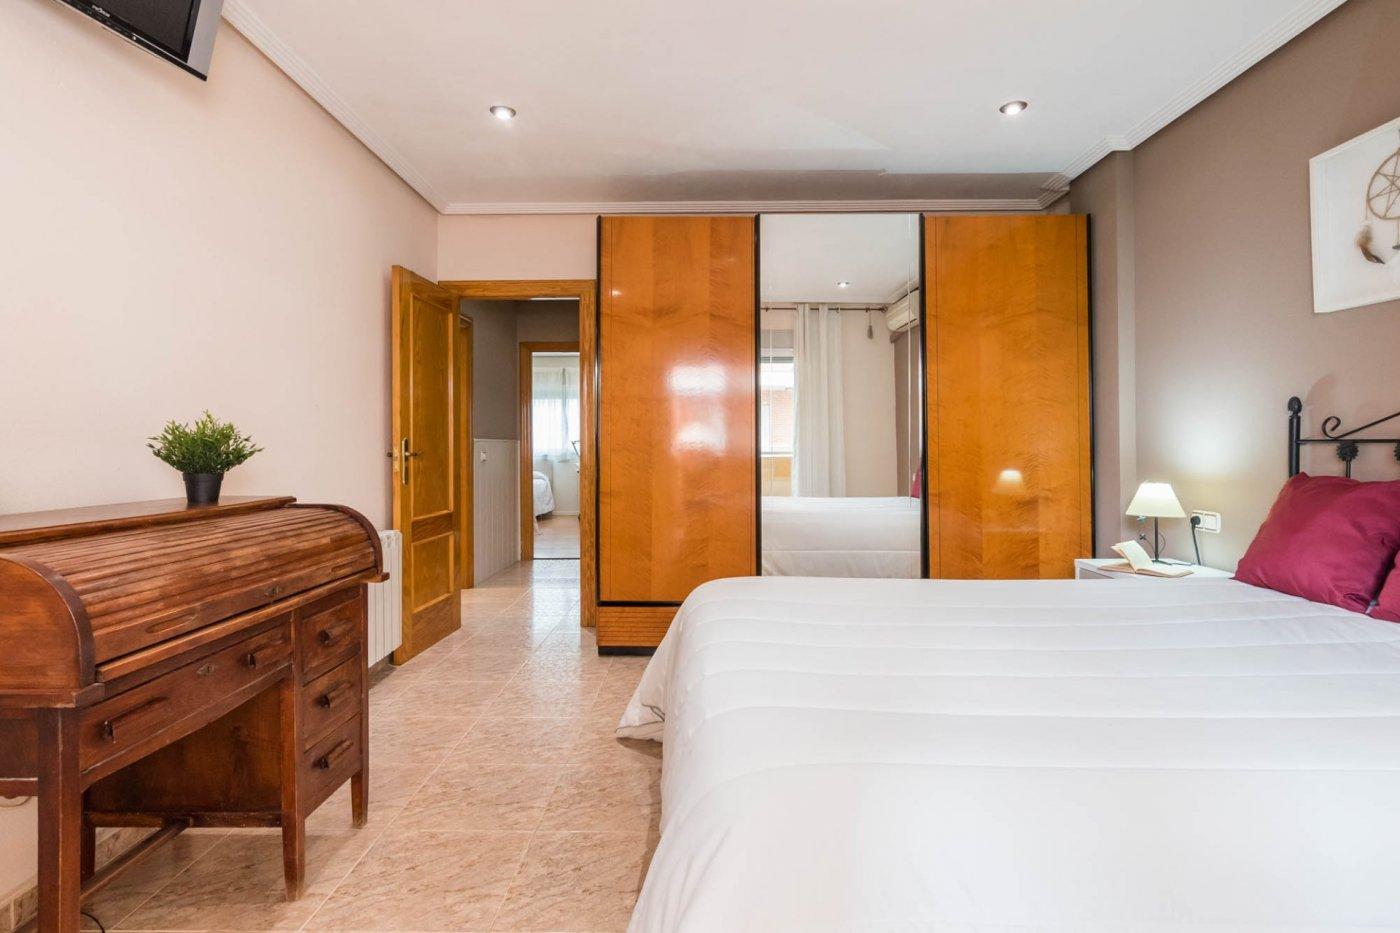 Dúplex · Alcantarilla · Alcantarilla 149.900€€